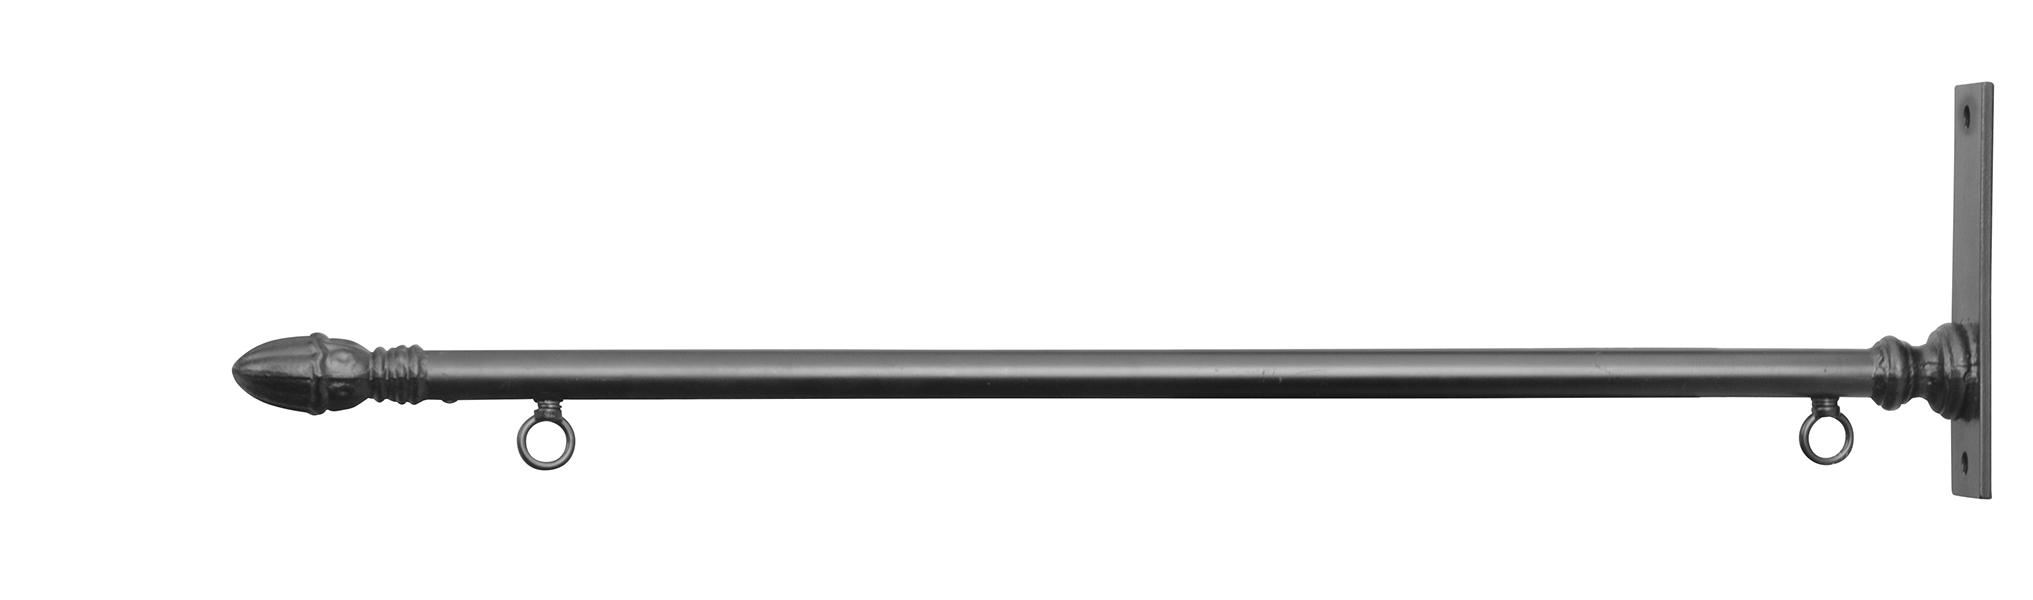 FLB-003